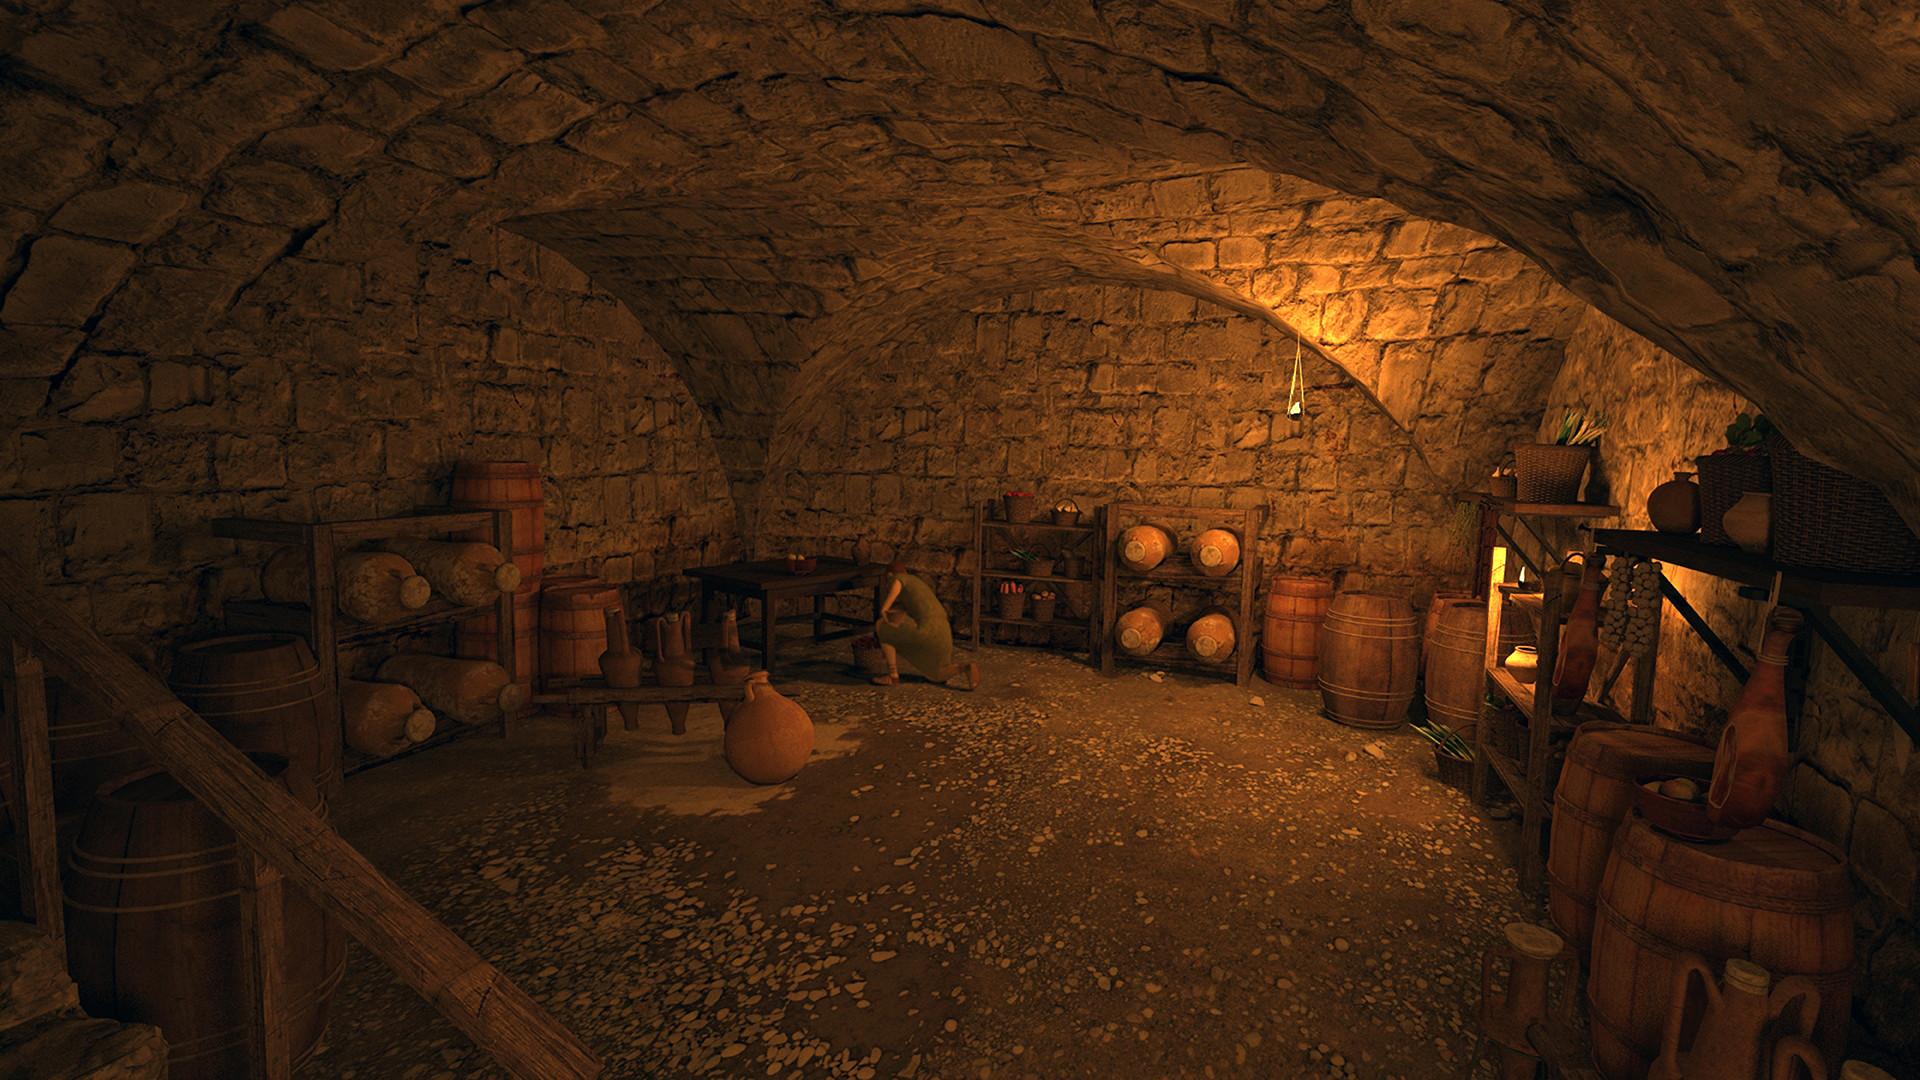 Juan torrejon carnuntum cellar 01 2